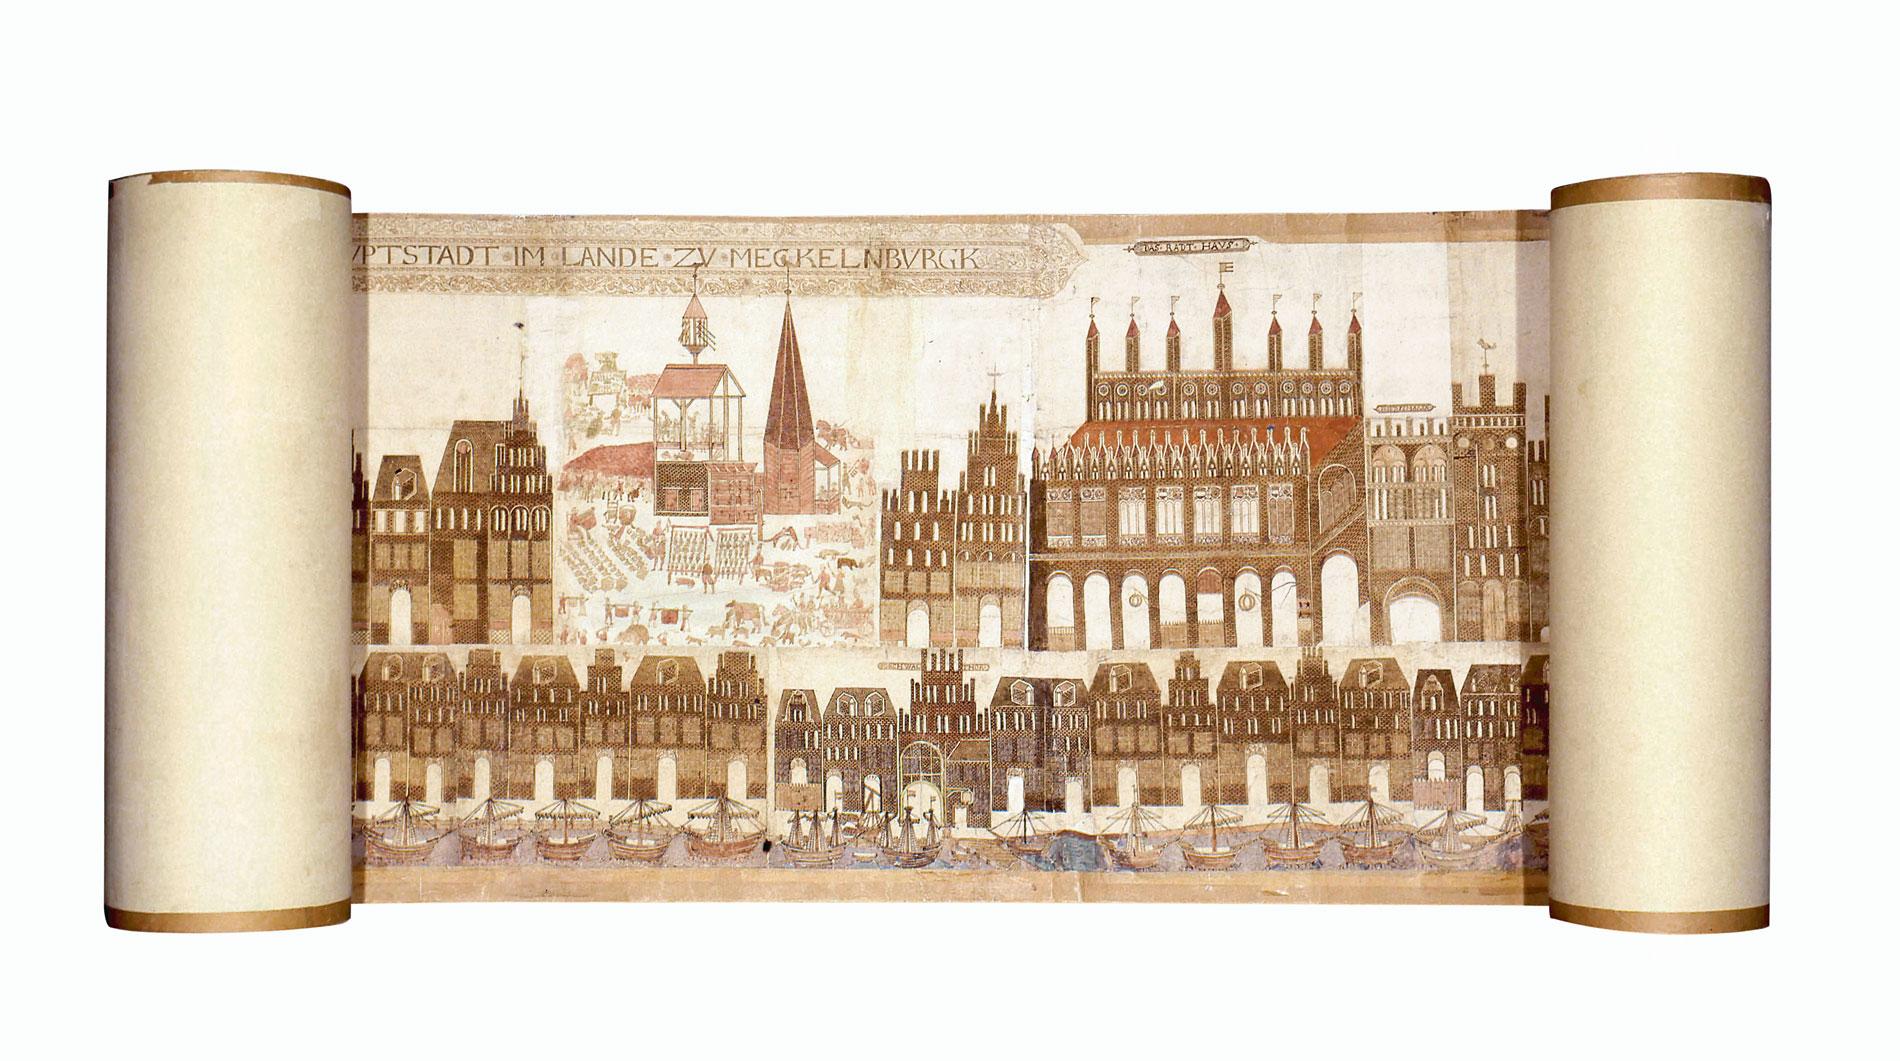 Vicke-Schorler-Rolle, 1.868 × 60 cm; Stadtarchiv Rostock